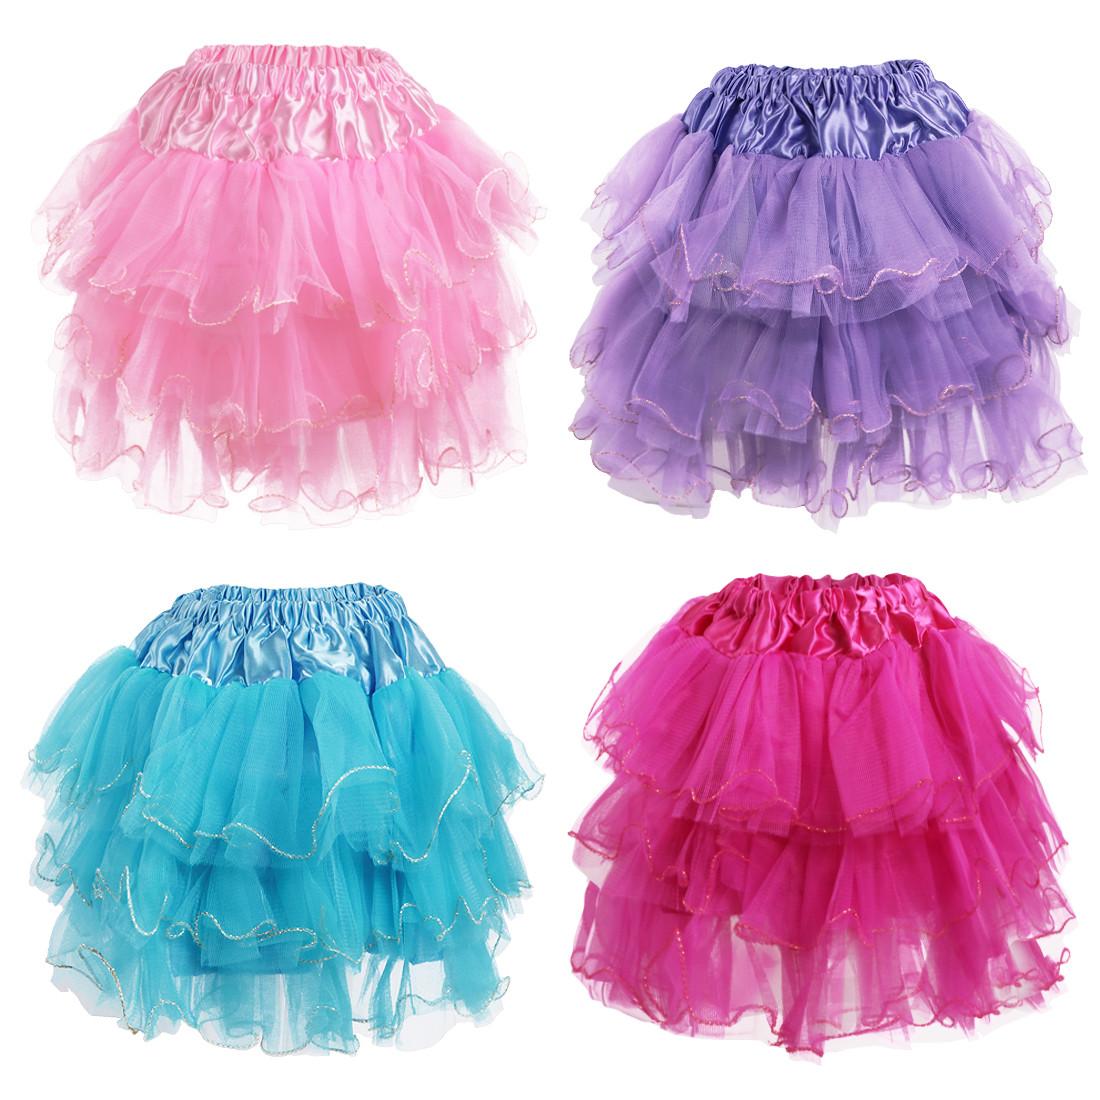 67bf4d598 Kilofly 4 pcs Girls Ballet Tutu Pleated Princess Party Fluffy Tulle Skirt  Dress. Loading zoom